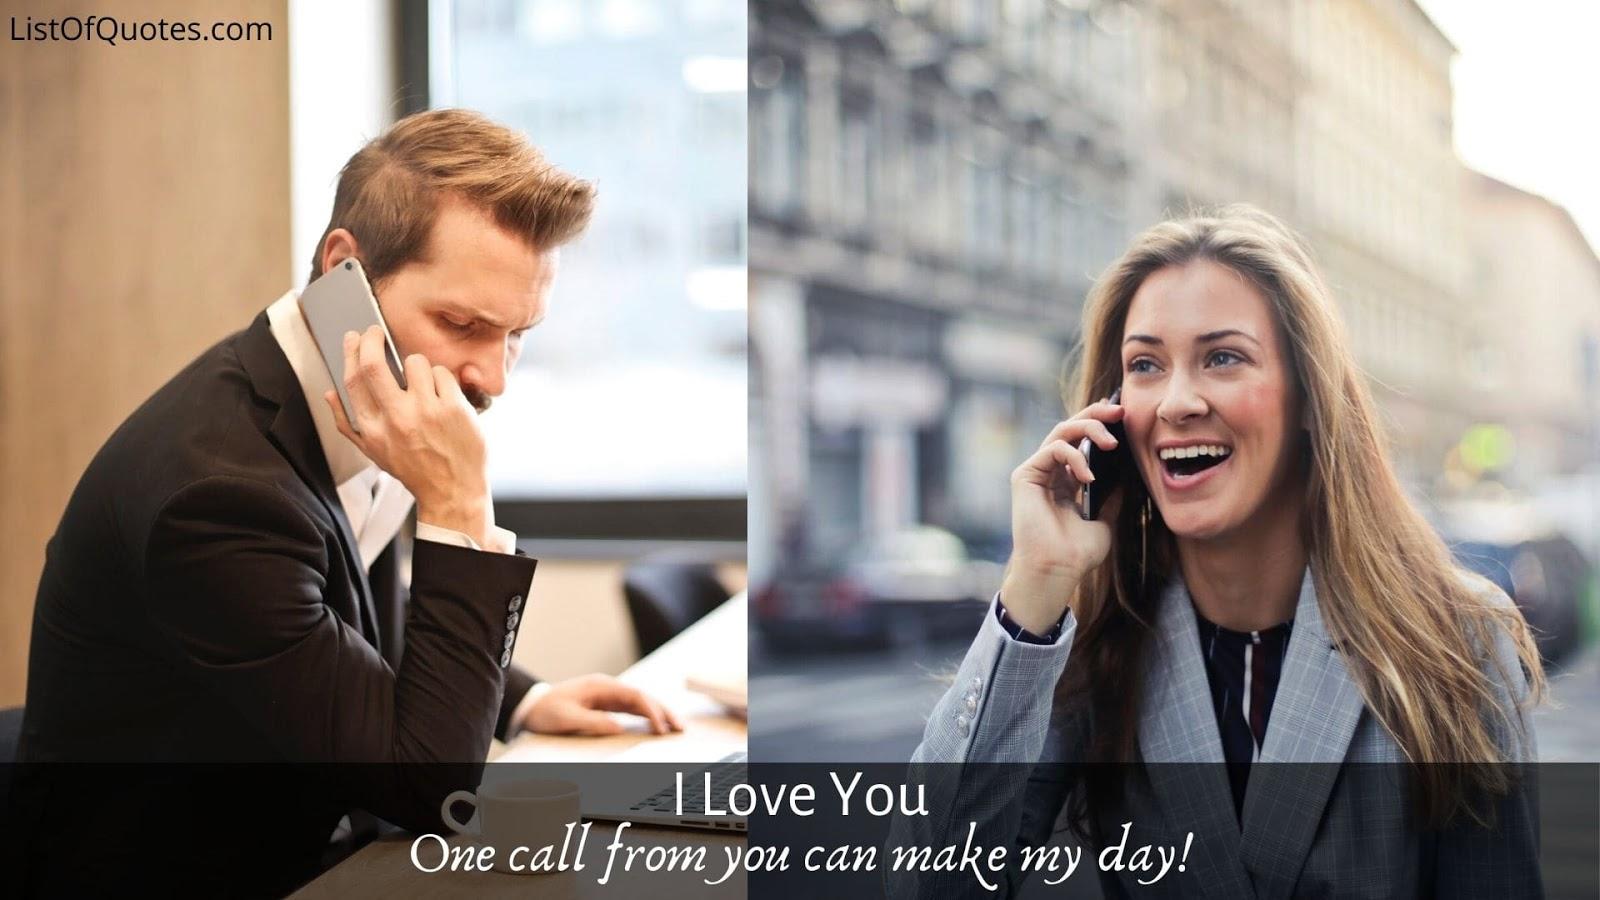 inspirational message for long distance relationship for girlfriend boyfriend